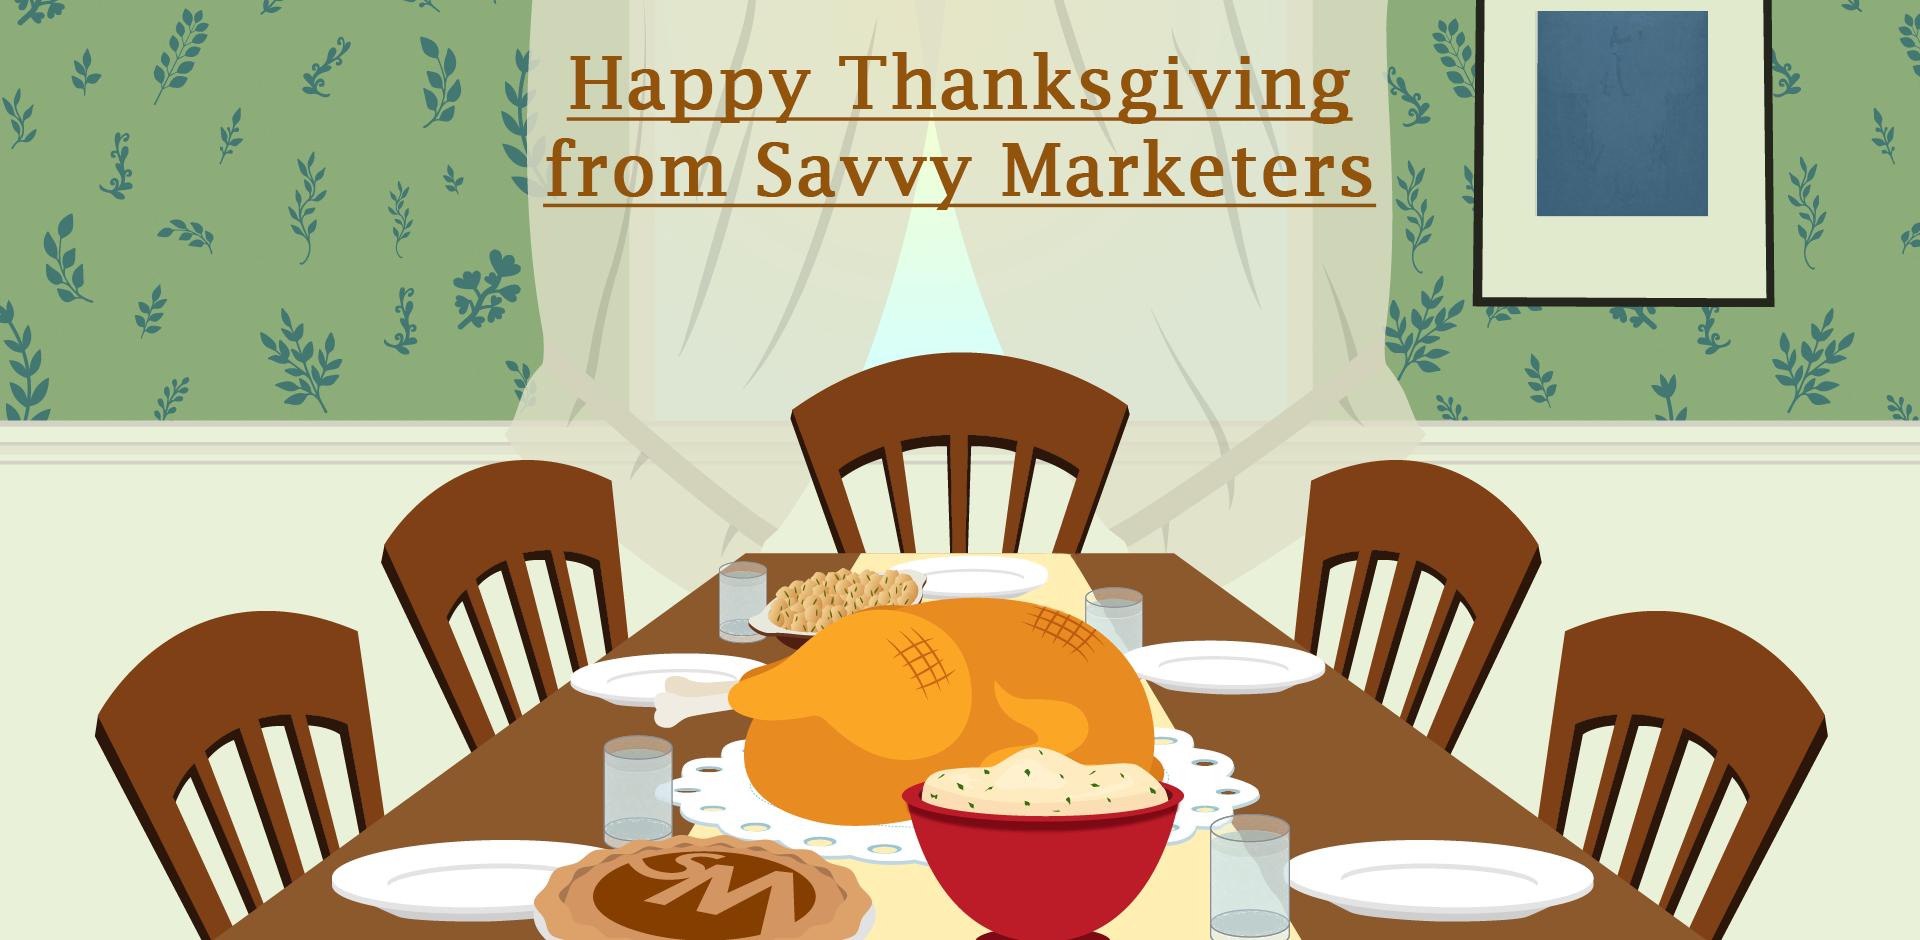 Header Image. Thanksgiving